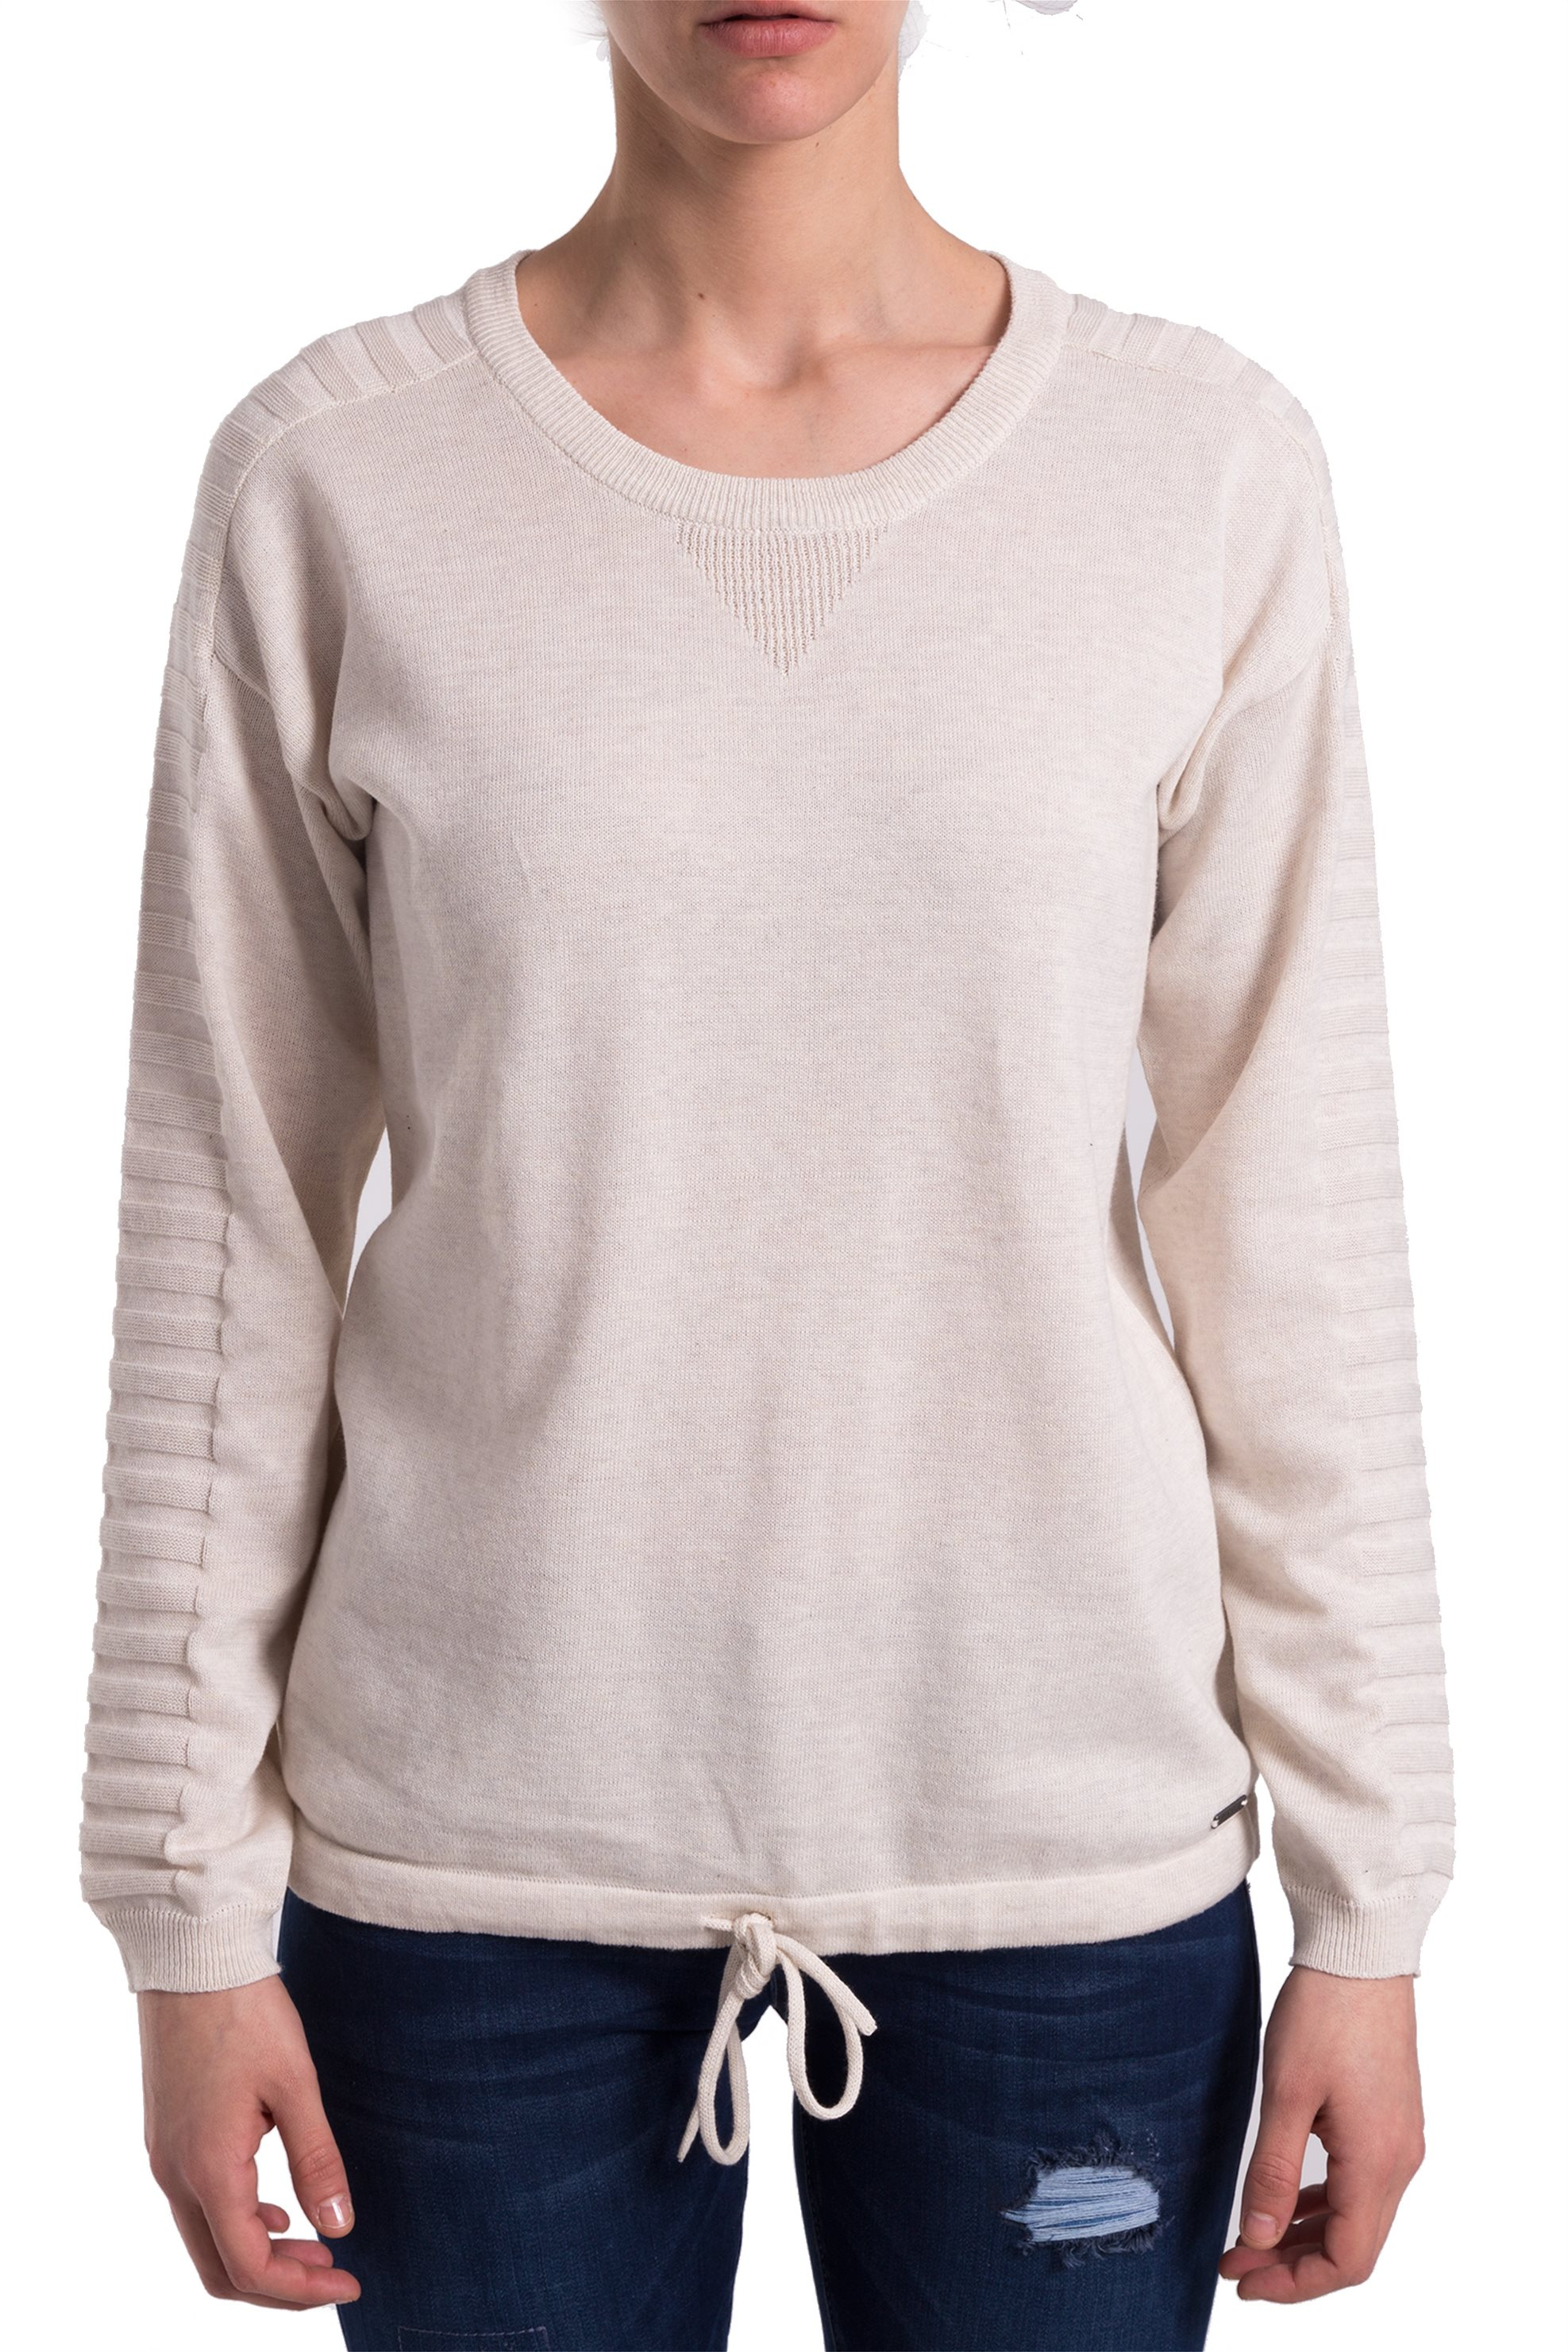 0a3a338f5a7e Γυναικεία   Ρούχα   Πλεκτά   Μπλούζες   Λεπτό πουλόβερ με άνοιγμα ...